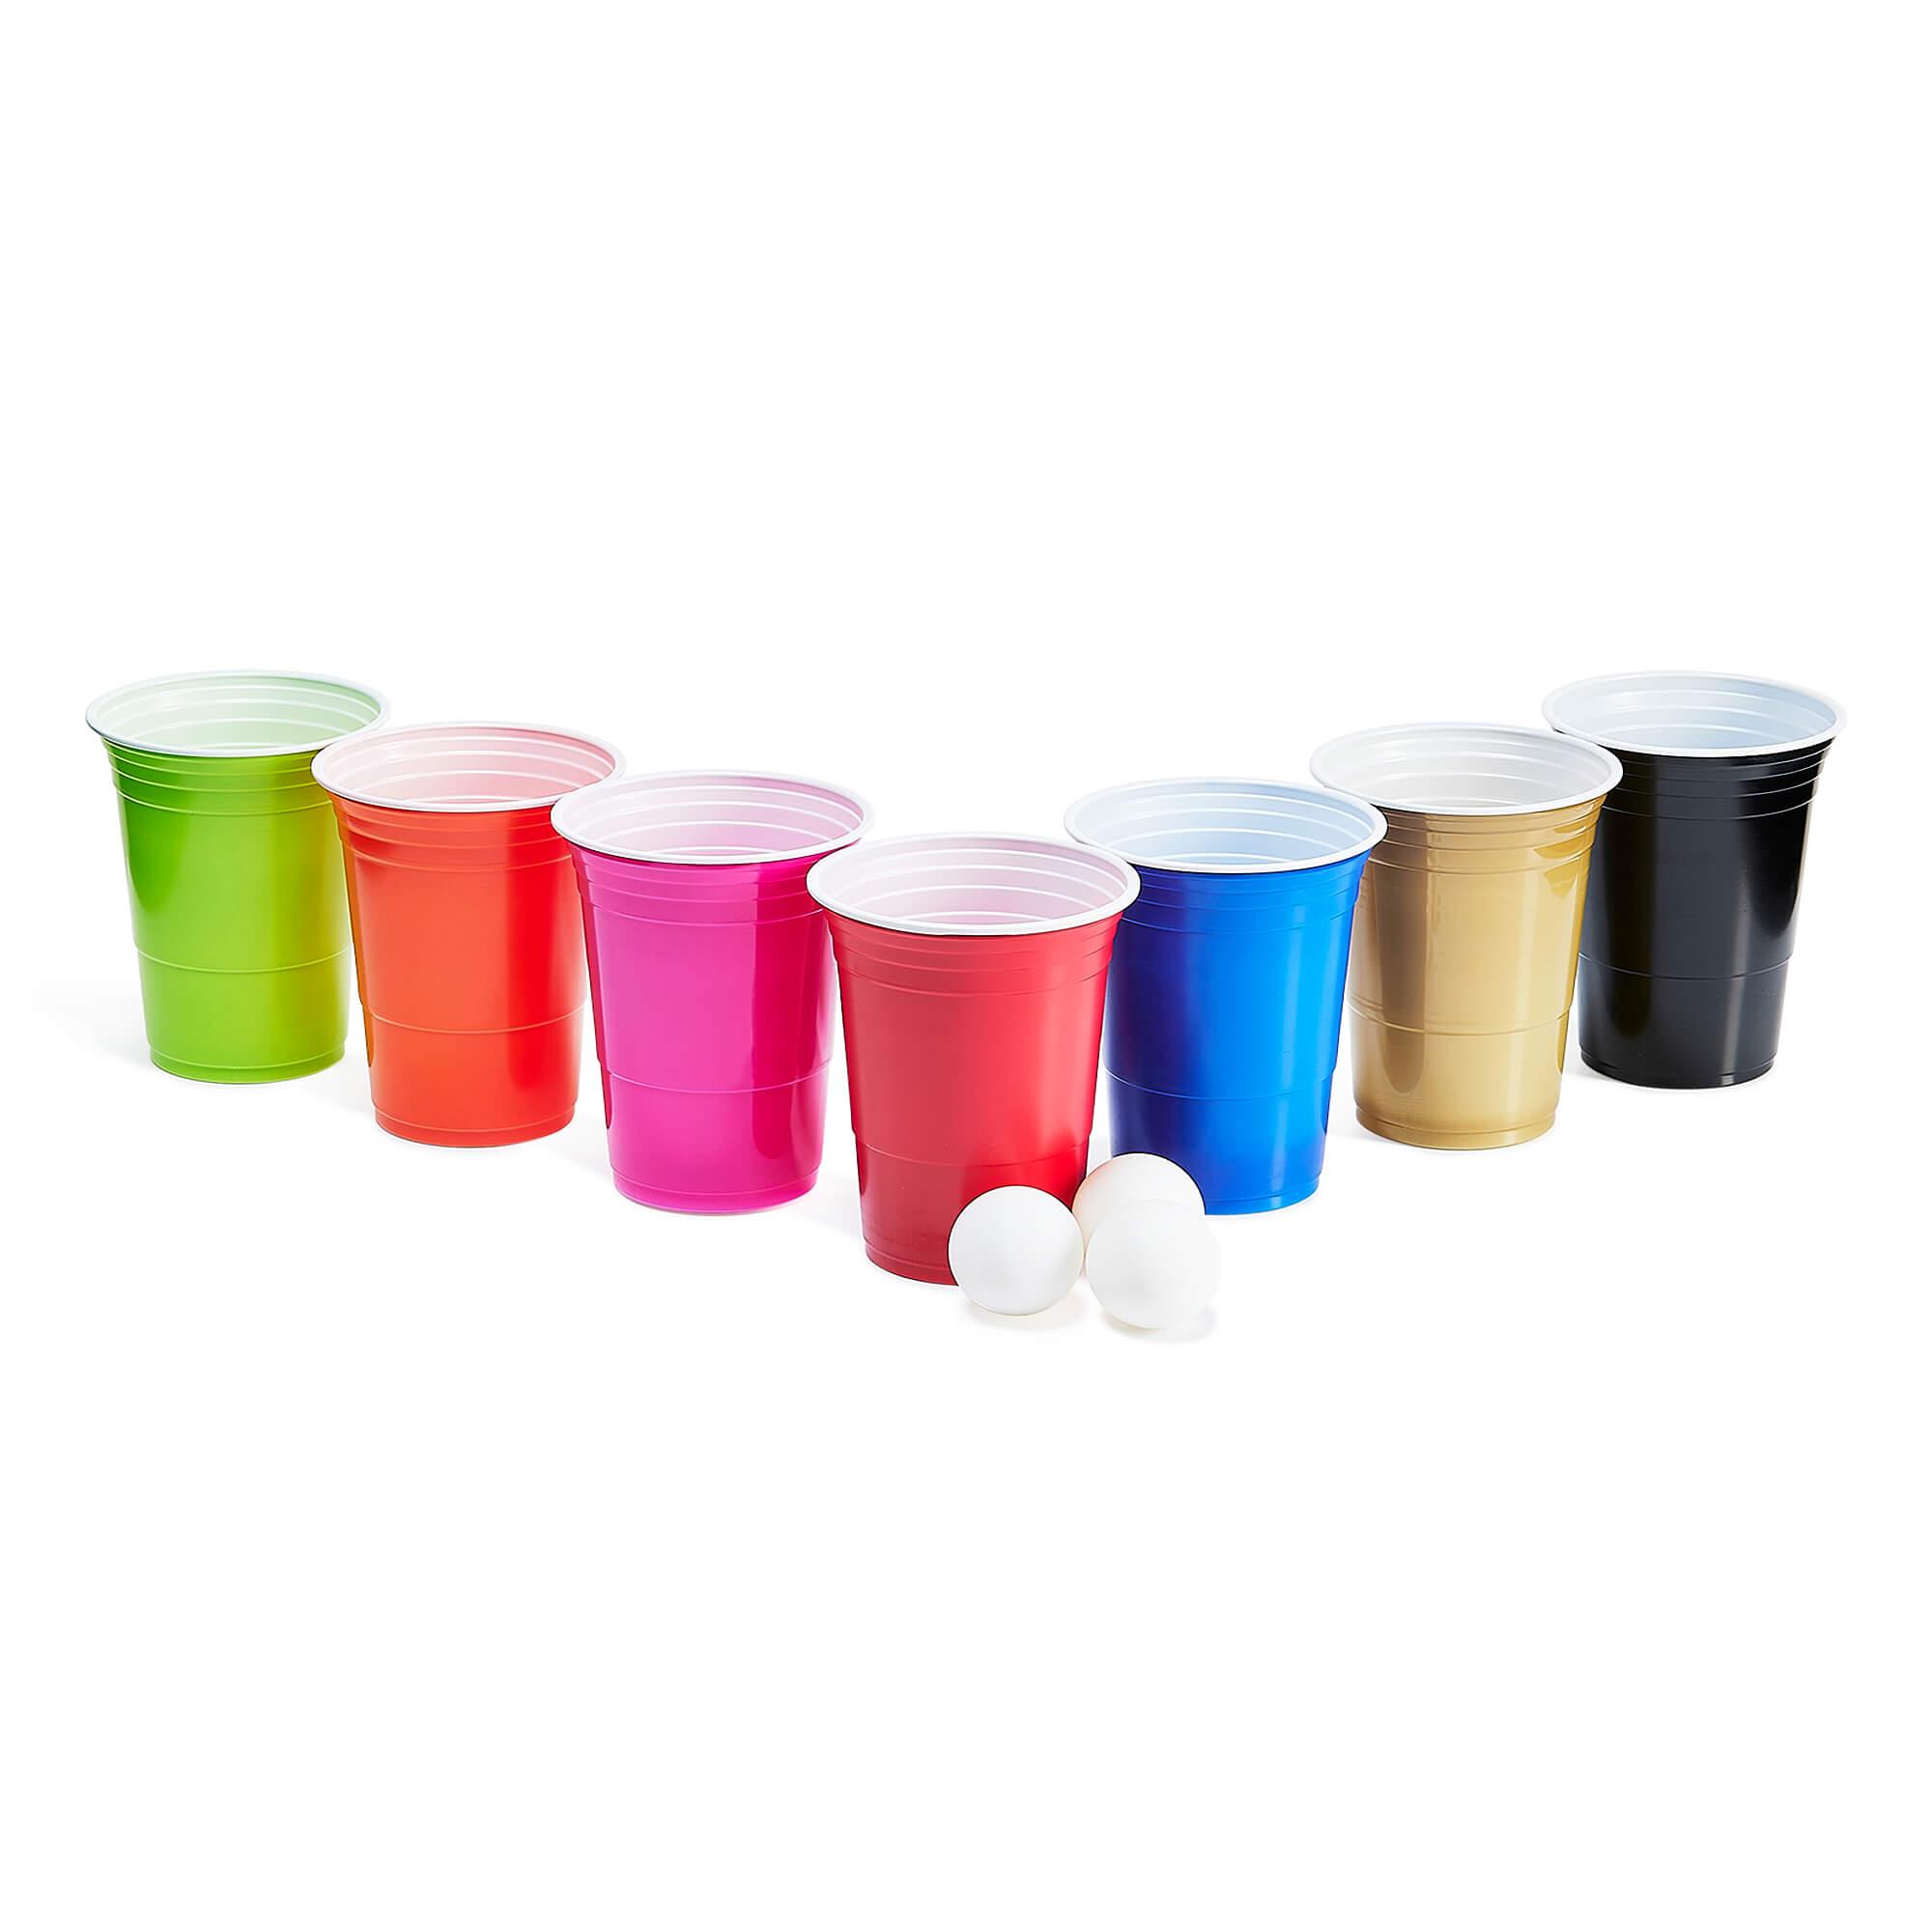 green washable cups overviewa